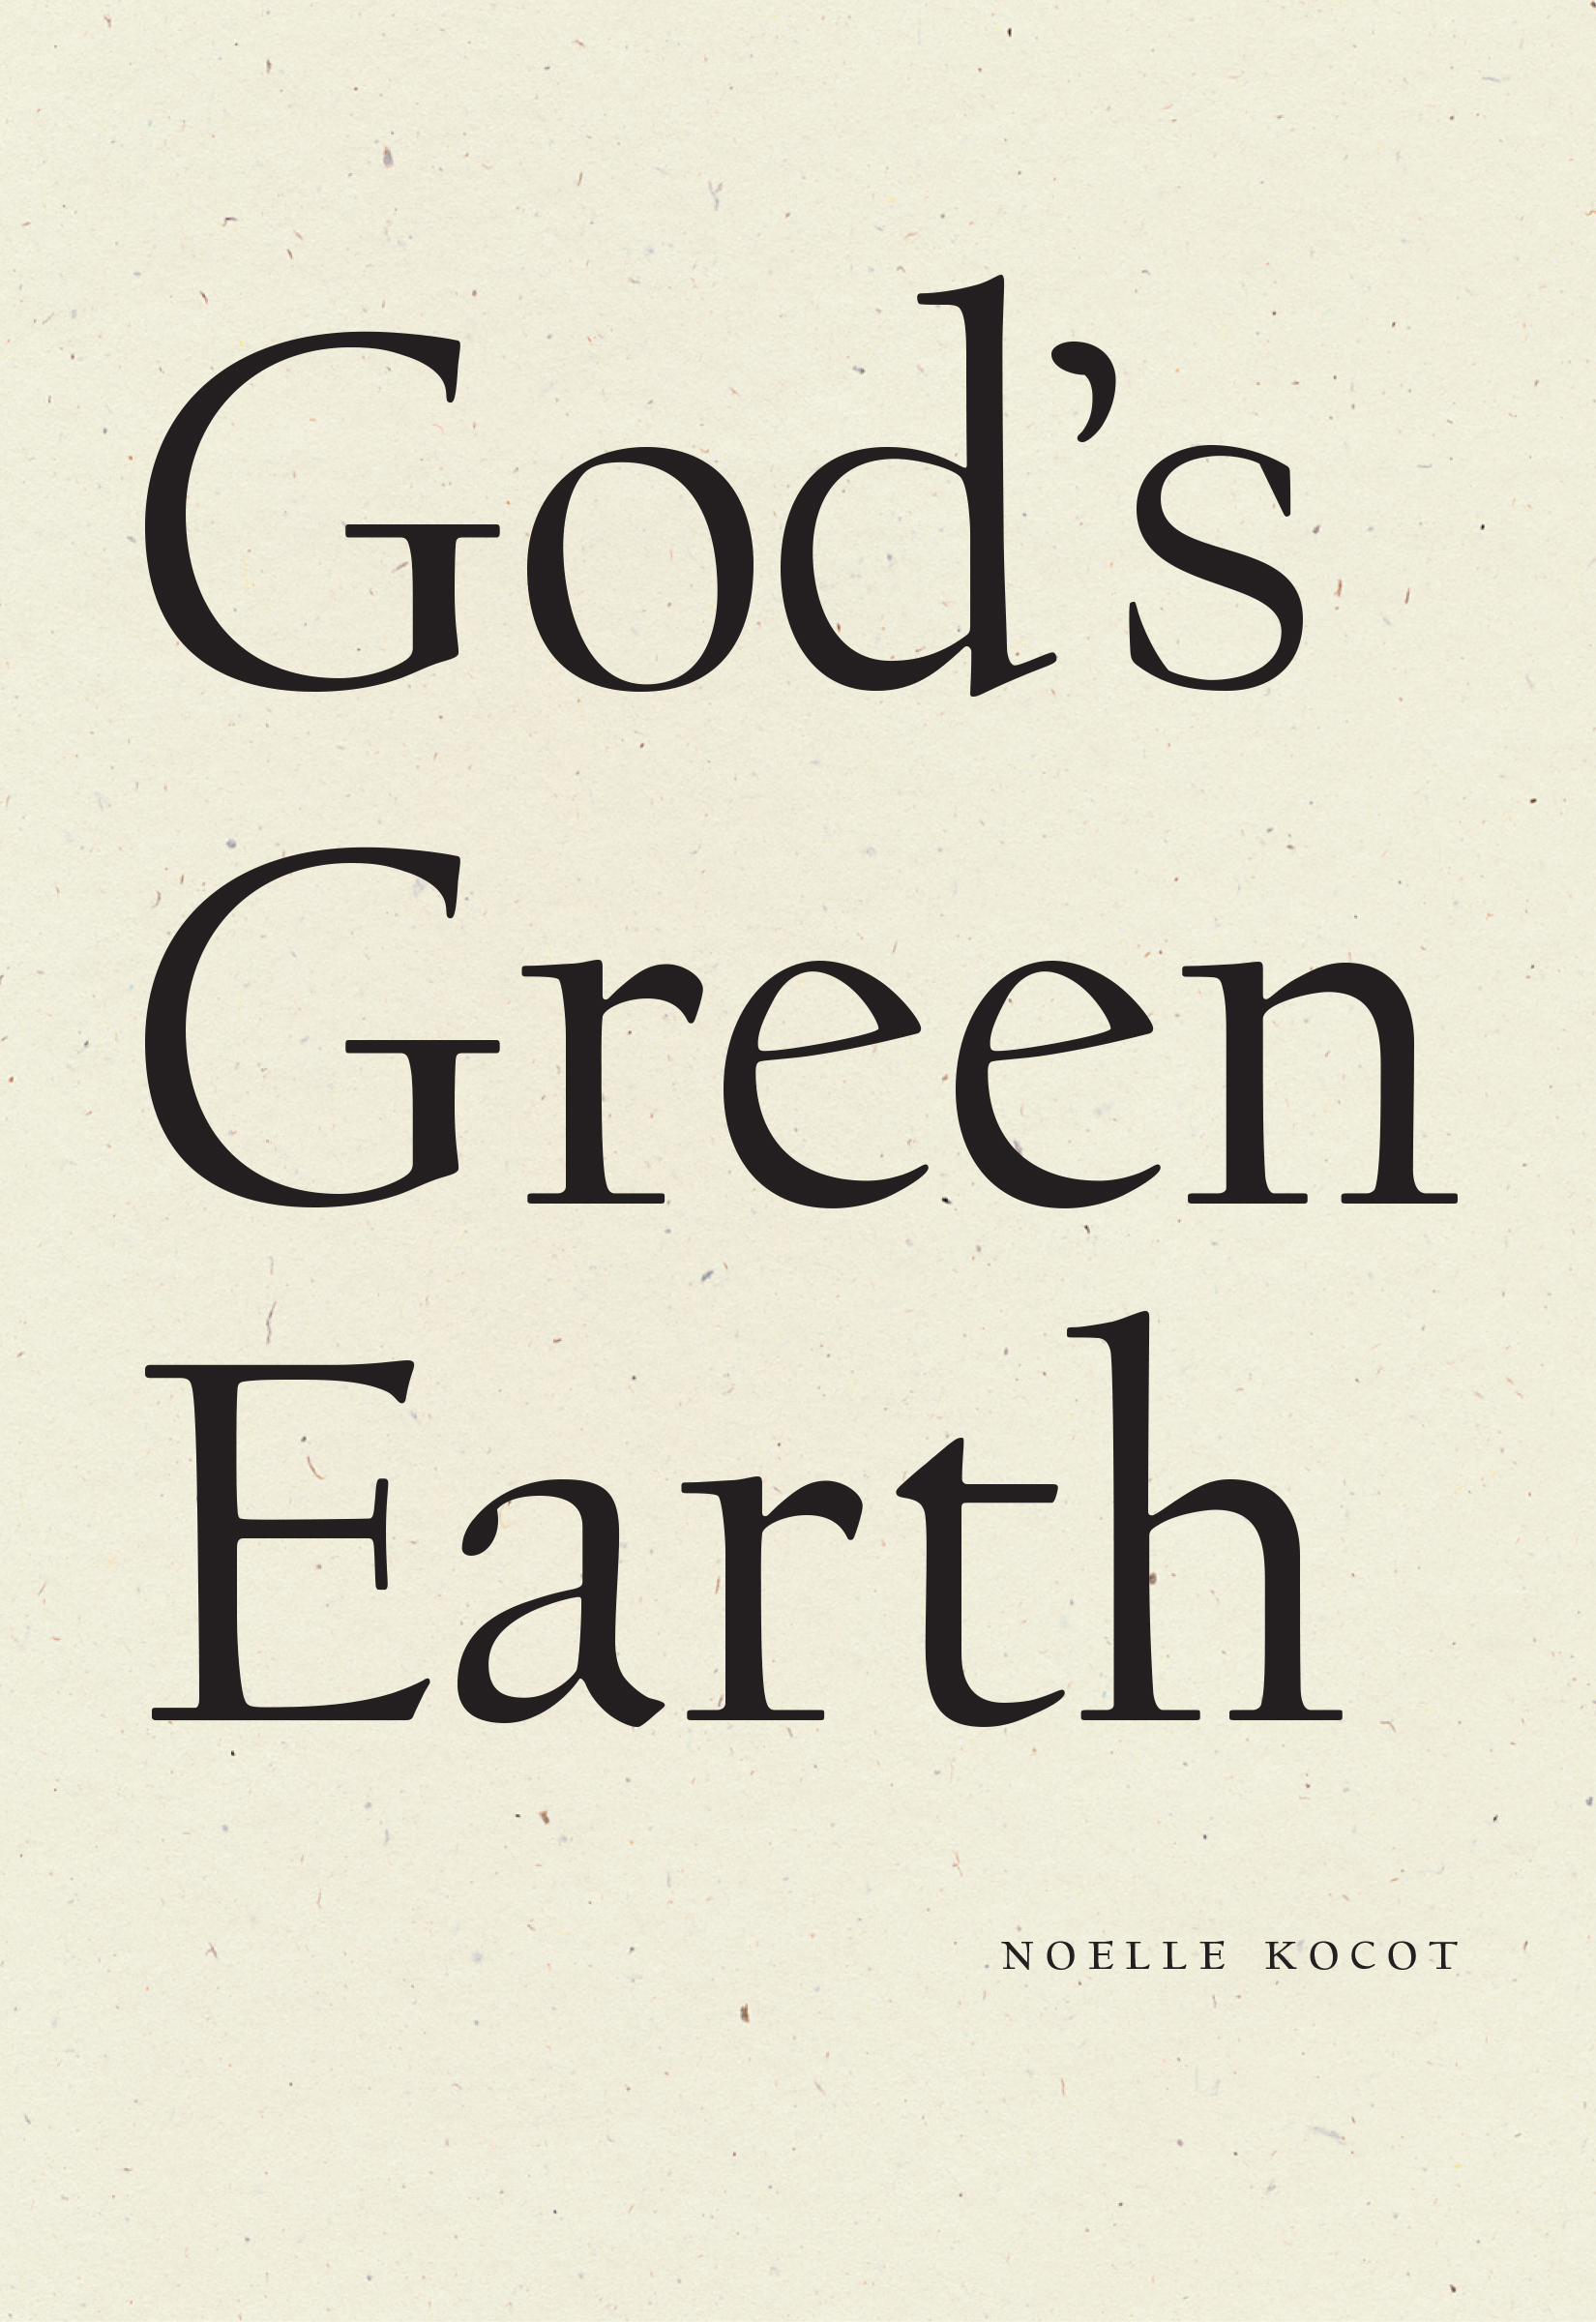 God's Green Earth By Noelle Kocot | Wave Books, 2020